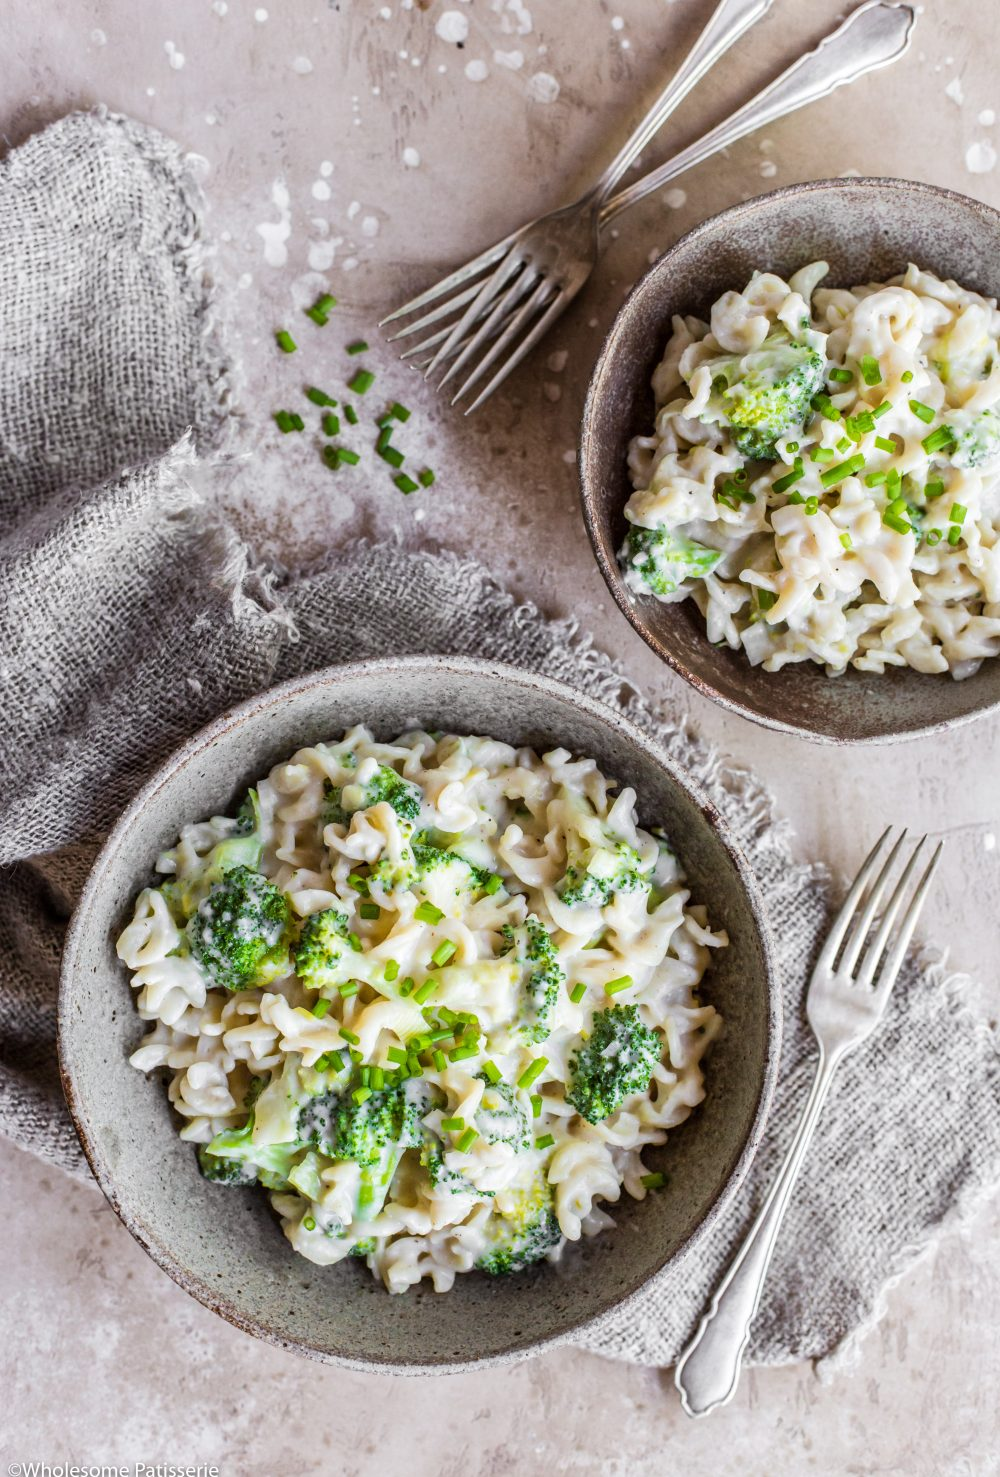 Creamy Broccoli Vegan Pasta! Dairy-free creamy homemade white sauce mixed with healthy & flavoursome veggies! #creamypasta #pasta #glutenfree #vegan